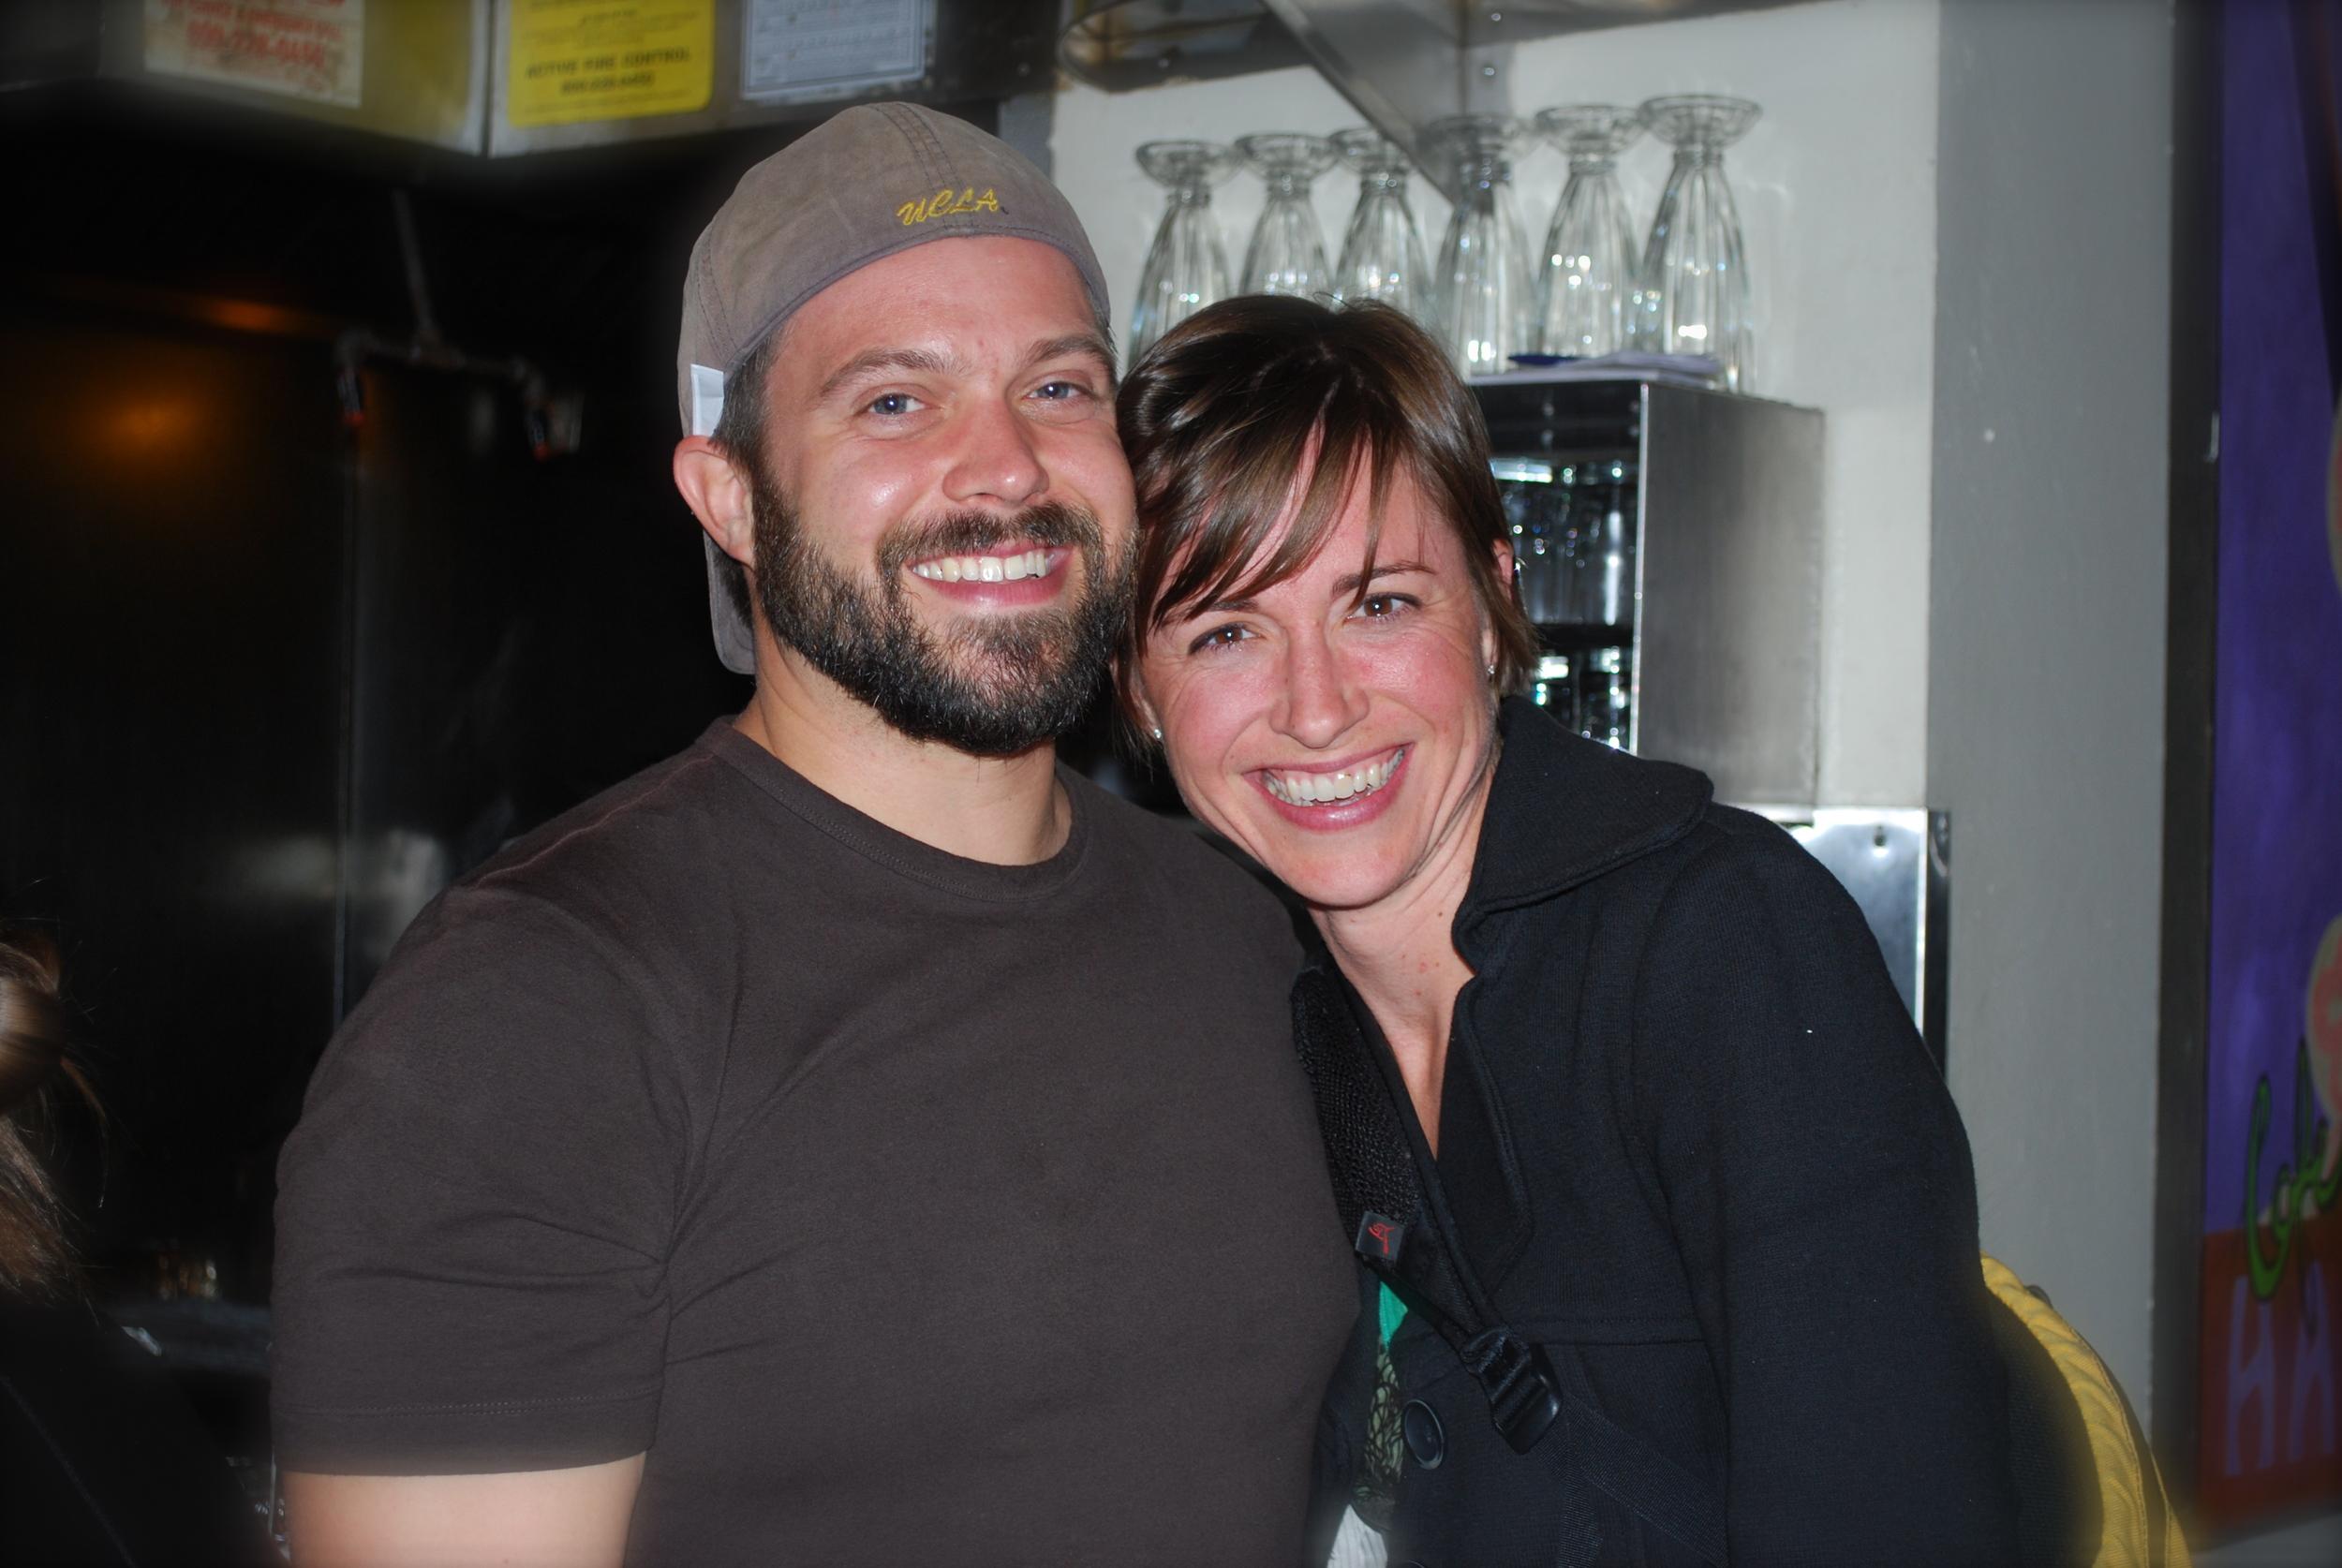 Matt and Taryn McLean